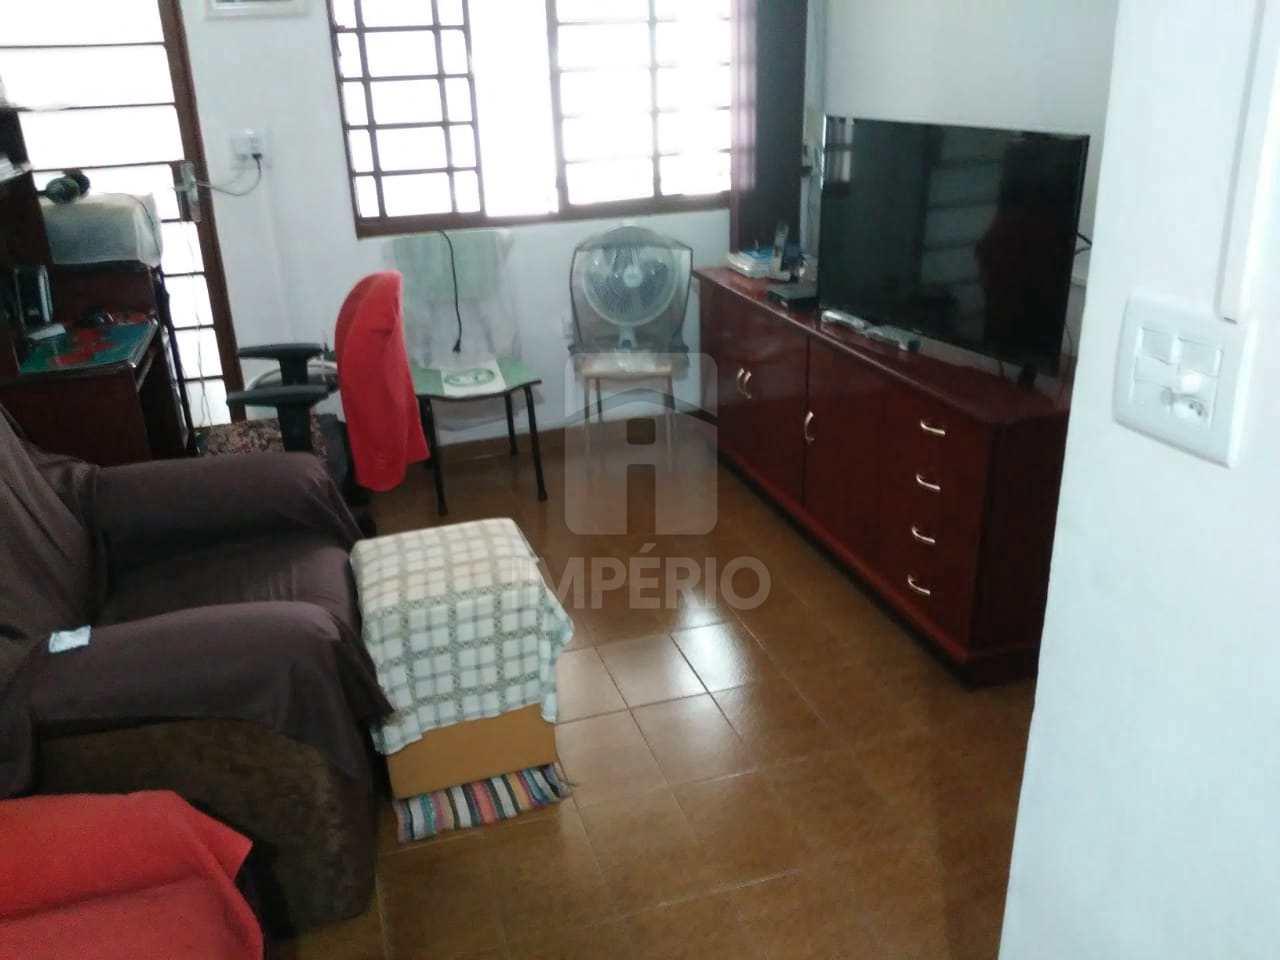 Casa com 4 dorms, Jardim Pedro Ometto, Jaú - R$ 190 mil, Cod: 328